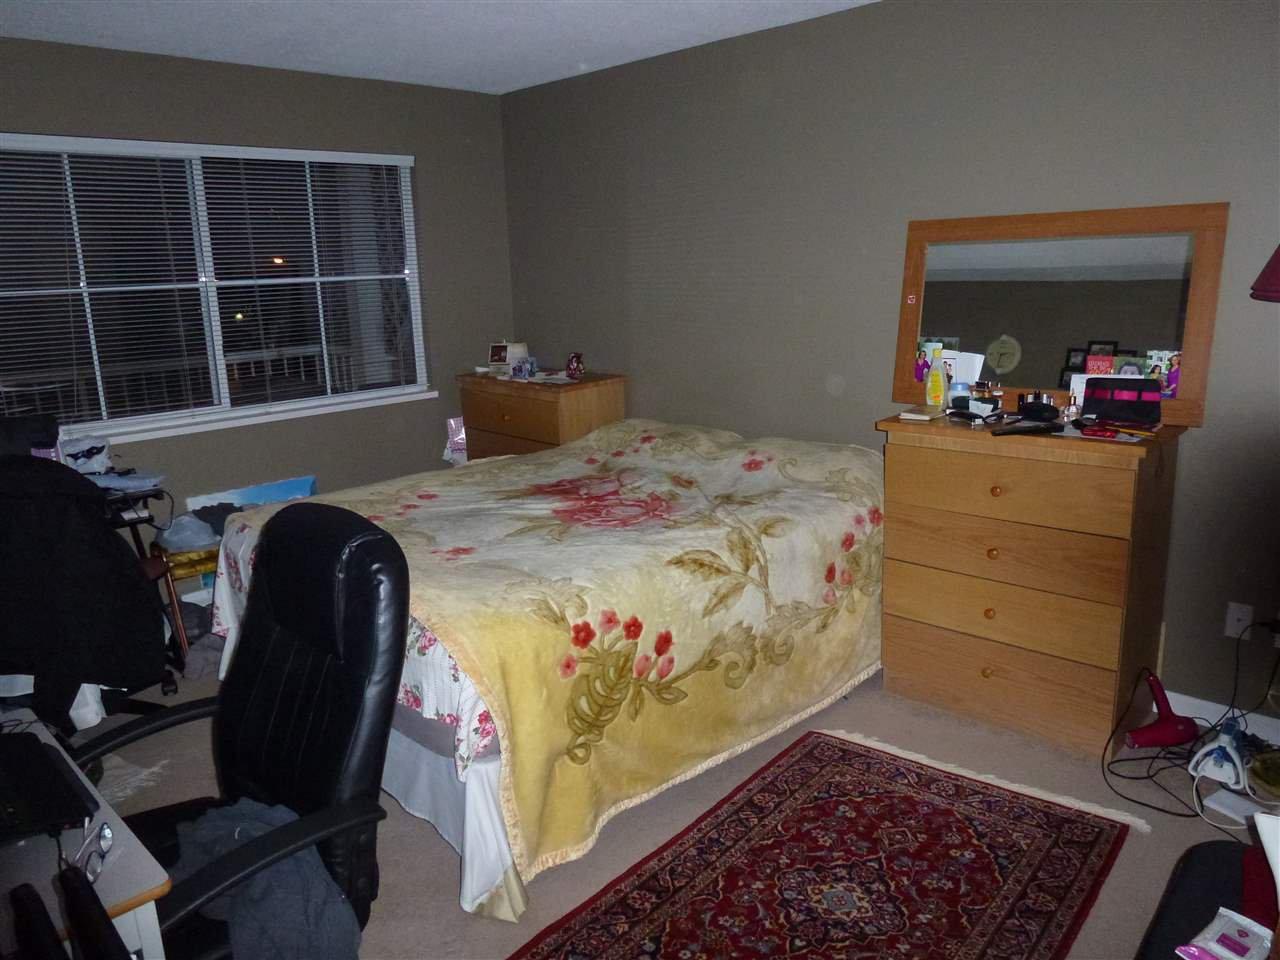 "Photo 6: Photos: 323 2678 DIXON Street in Port Coquitlam: Central Pt Coquitlam Condo for sale in ""SPRINGDALE"" : MLS®# R2041724"